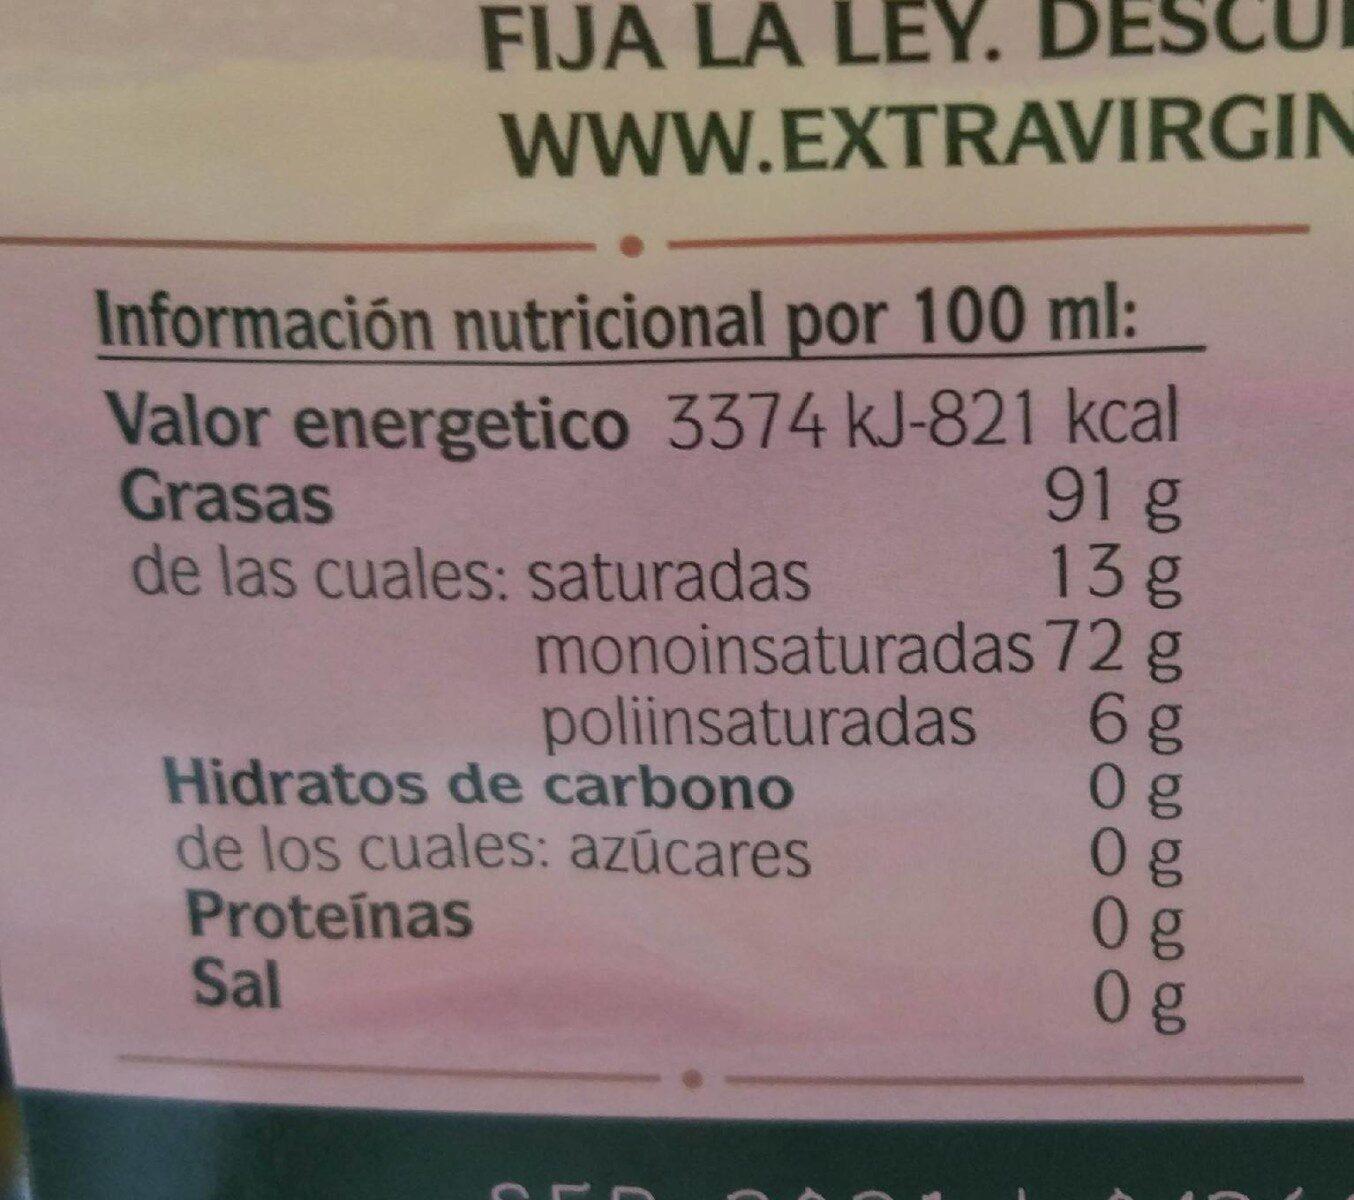 Aceite de oliva virgen extra - Informació nutricional - fr